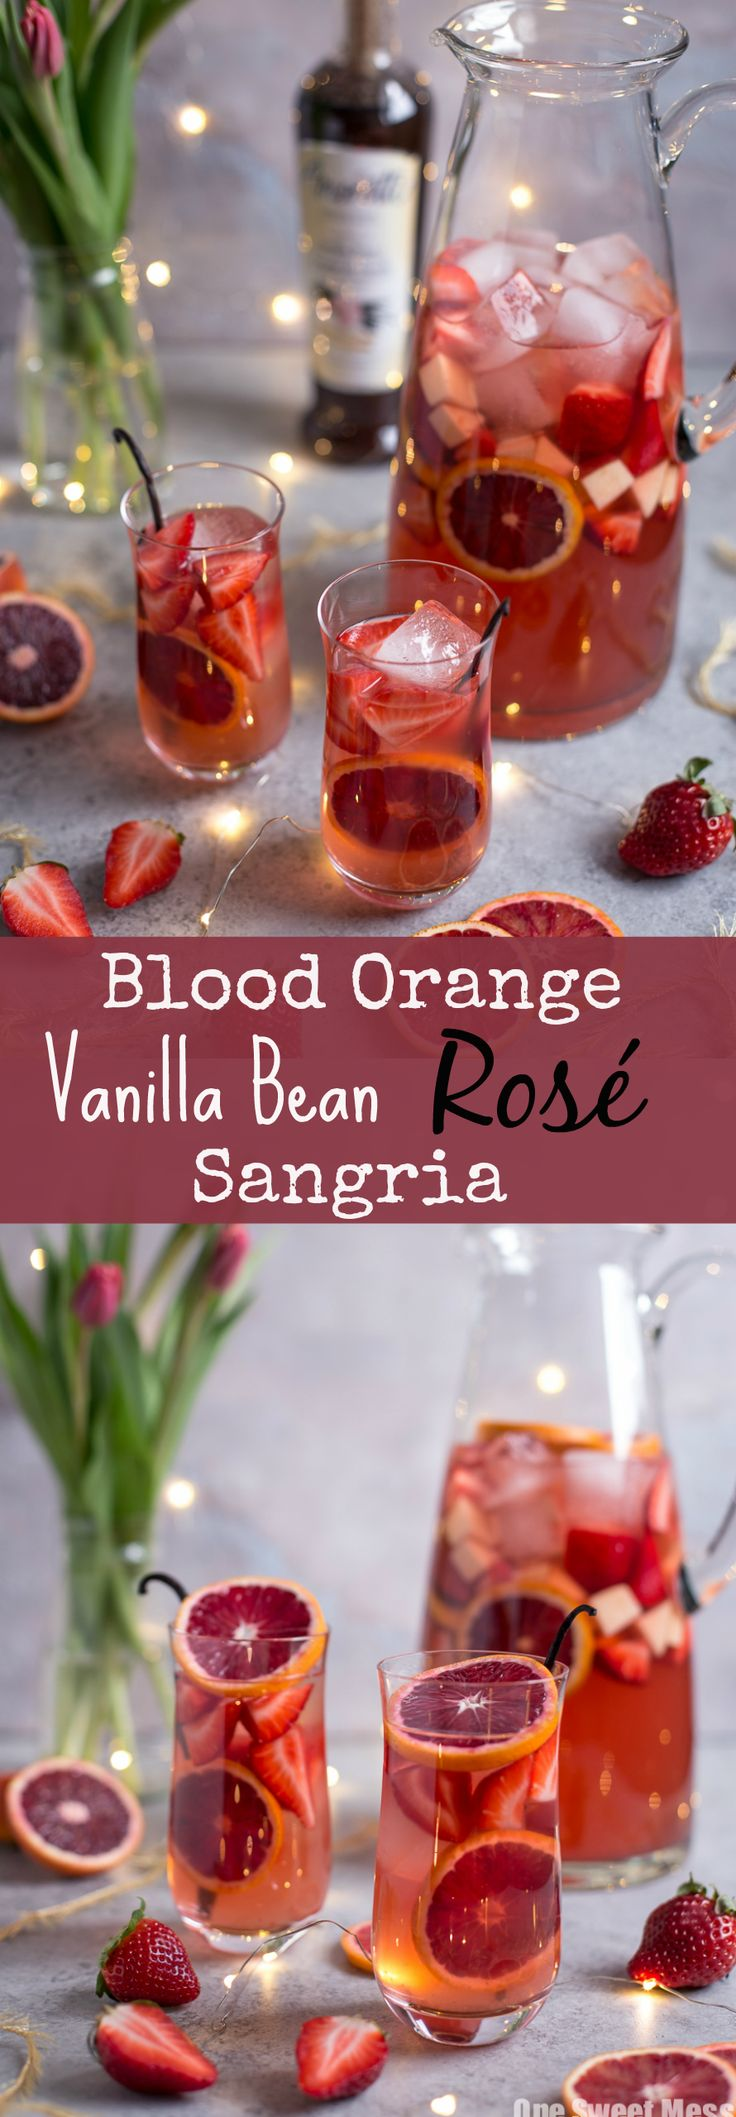 Blood Orange Vanilla Bean Rose Sangria